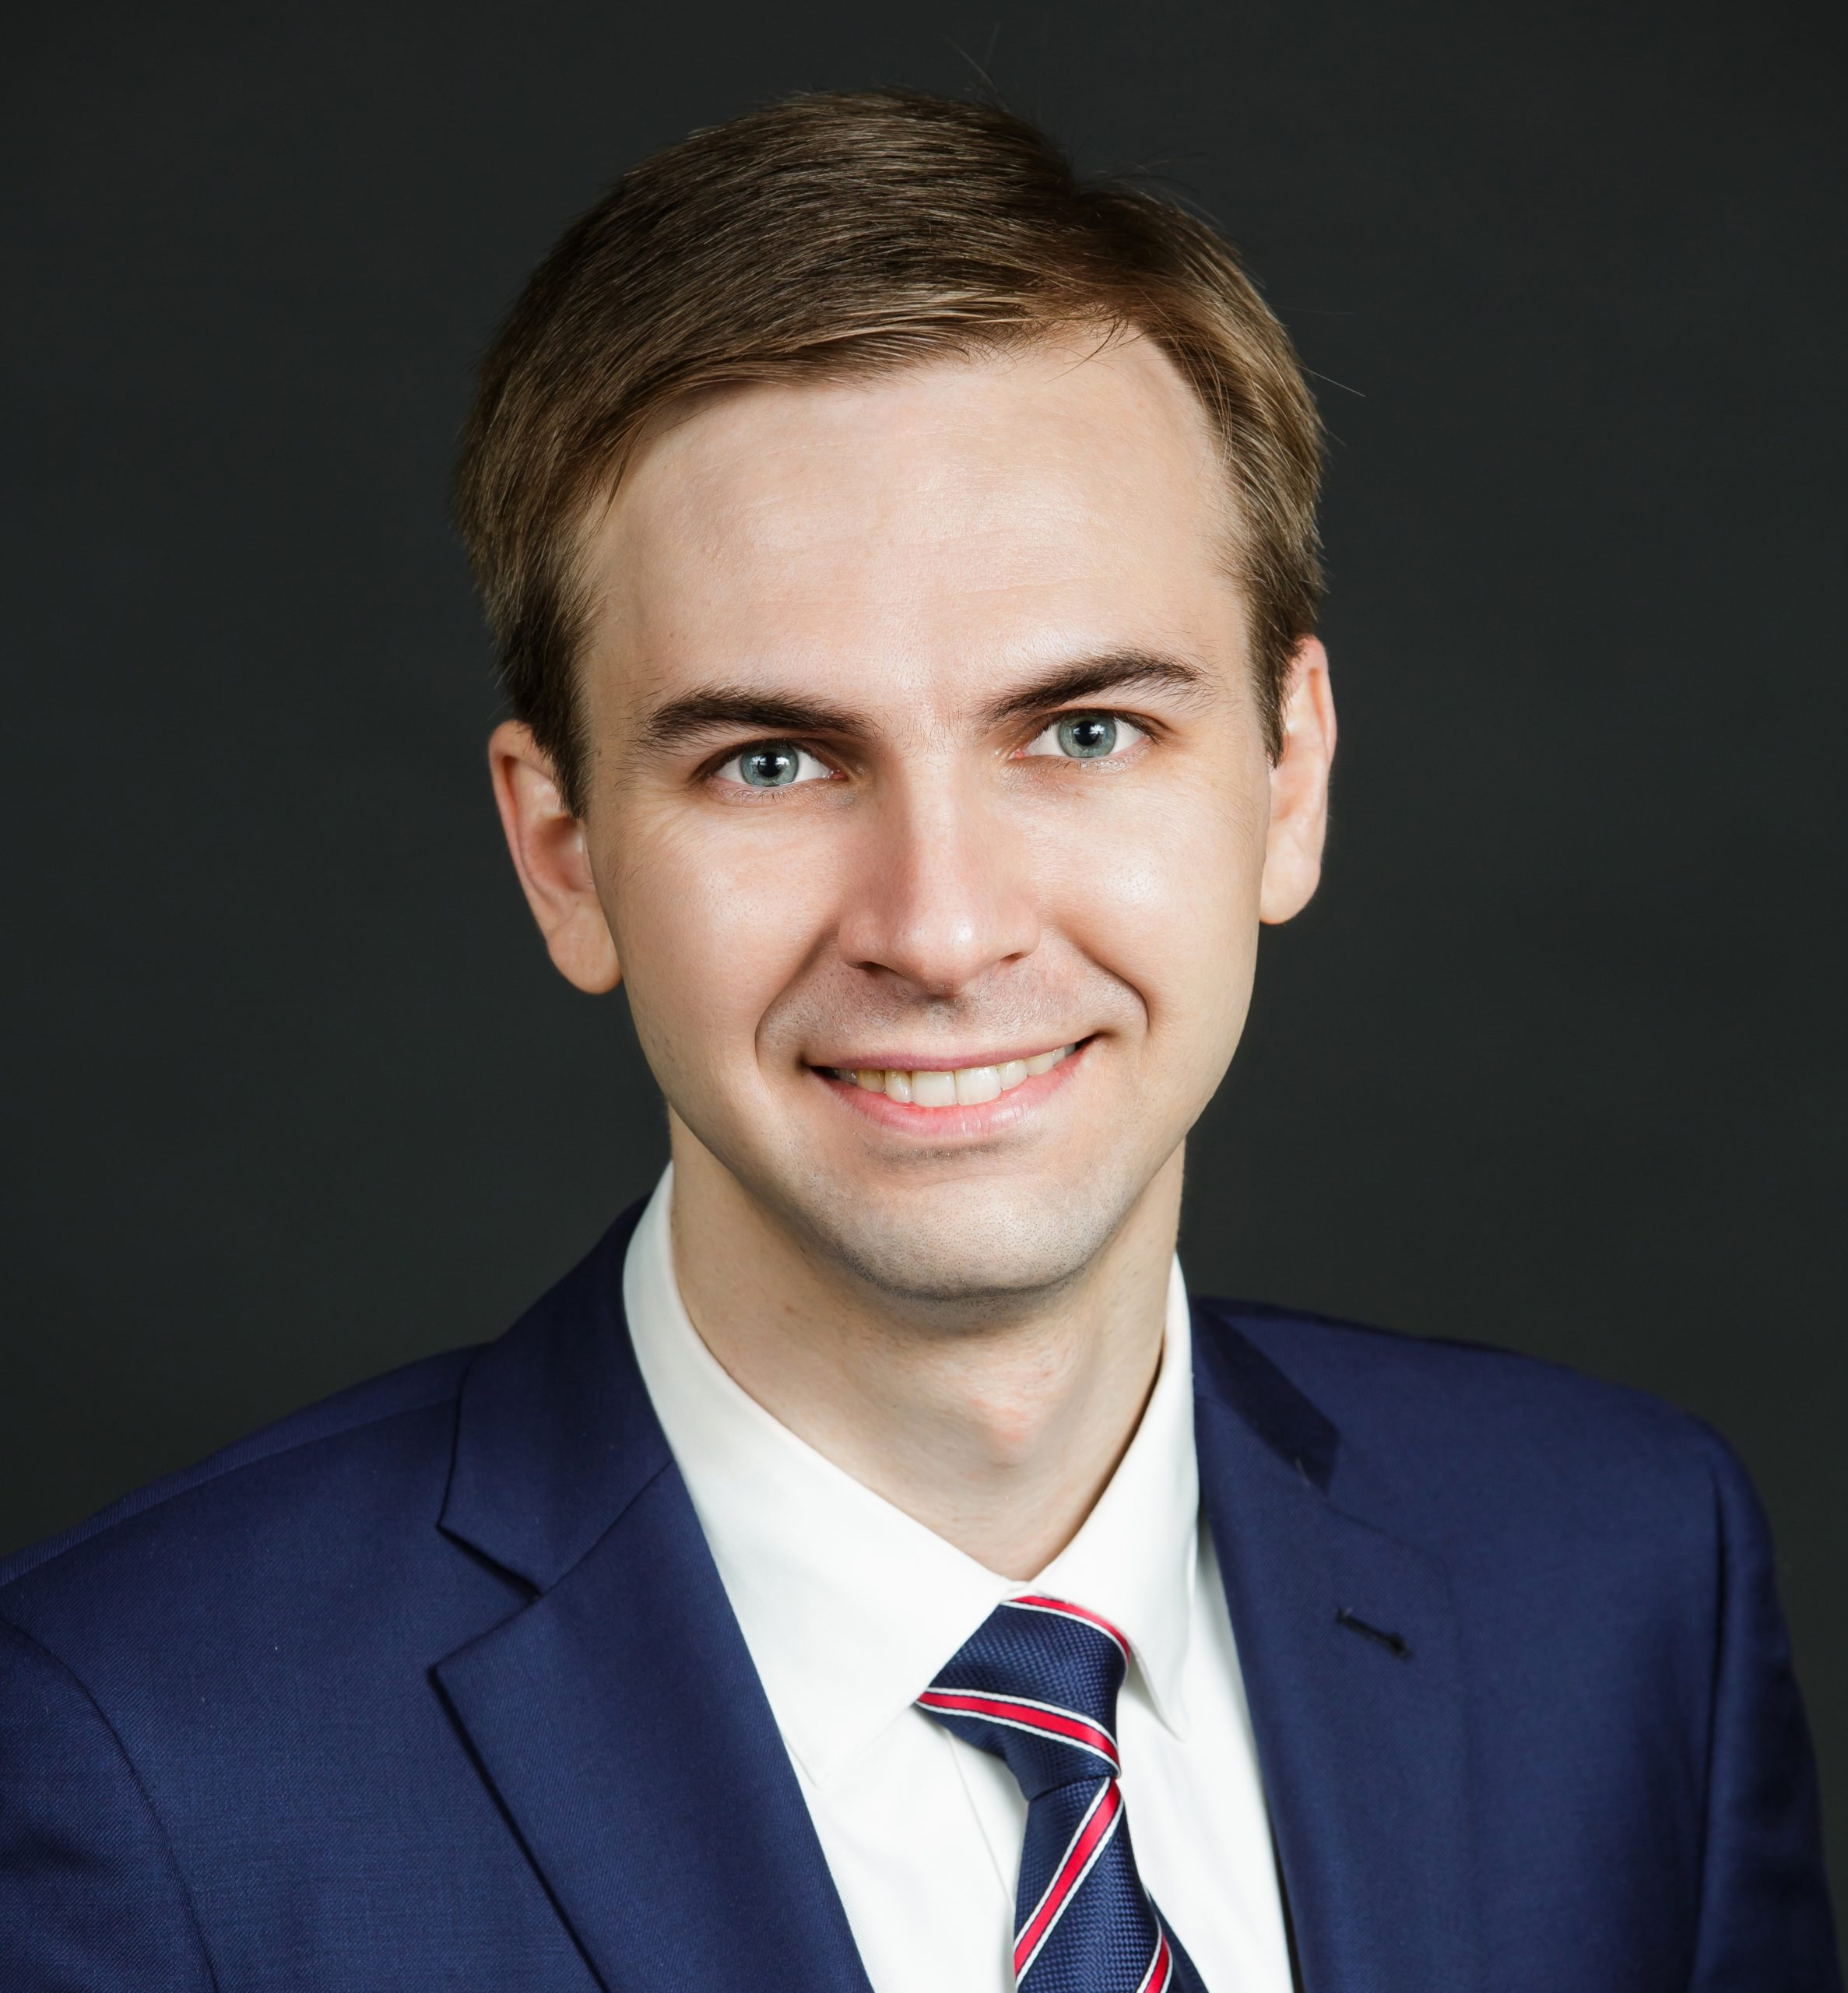 Ruslan Sverchkov